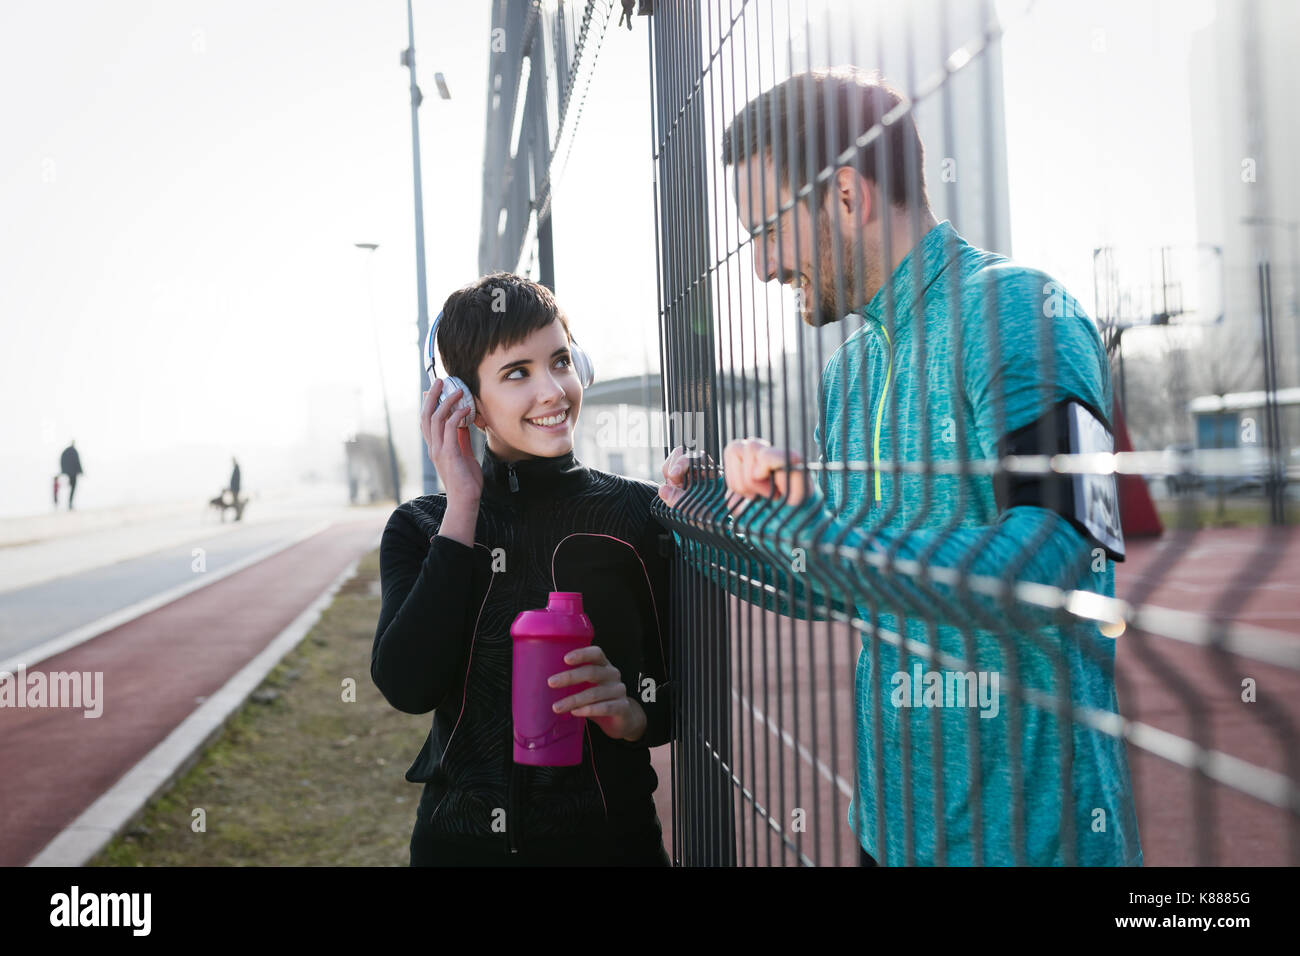 Deportista y sportswoman coqueteo outdoor fitness después de desempeño Imagen De Stock